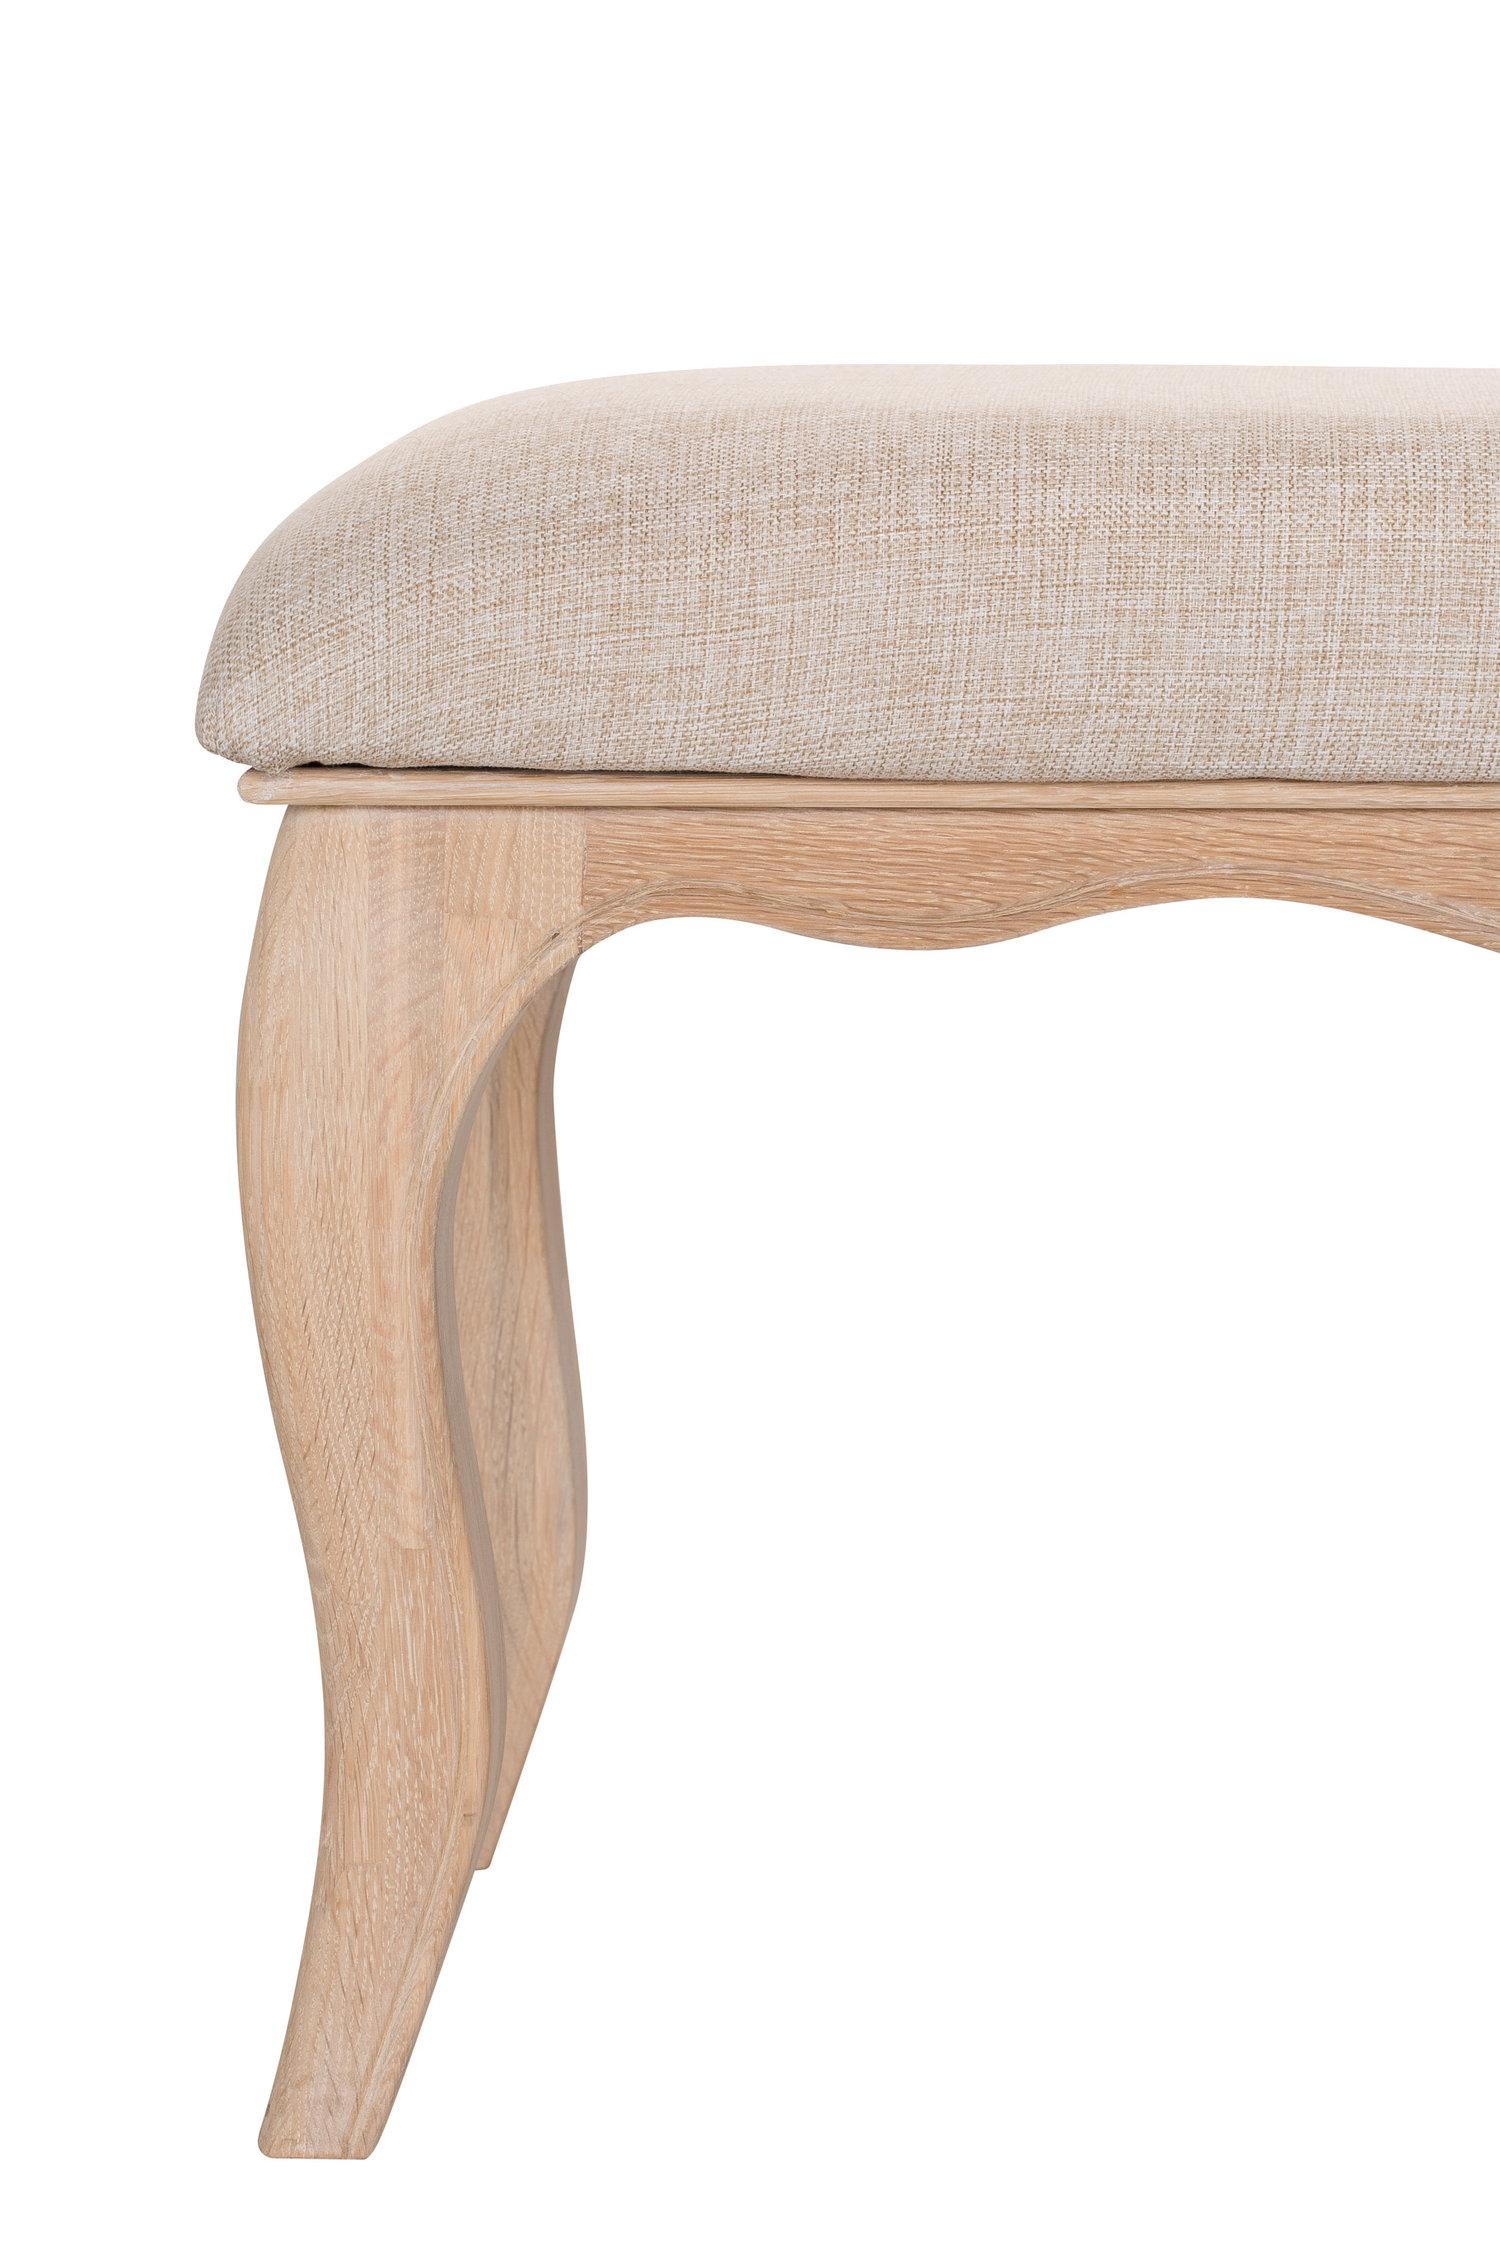 Simple_Furniture_product_TBP_8.jpg